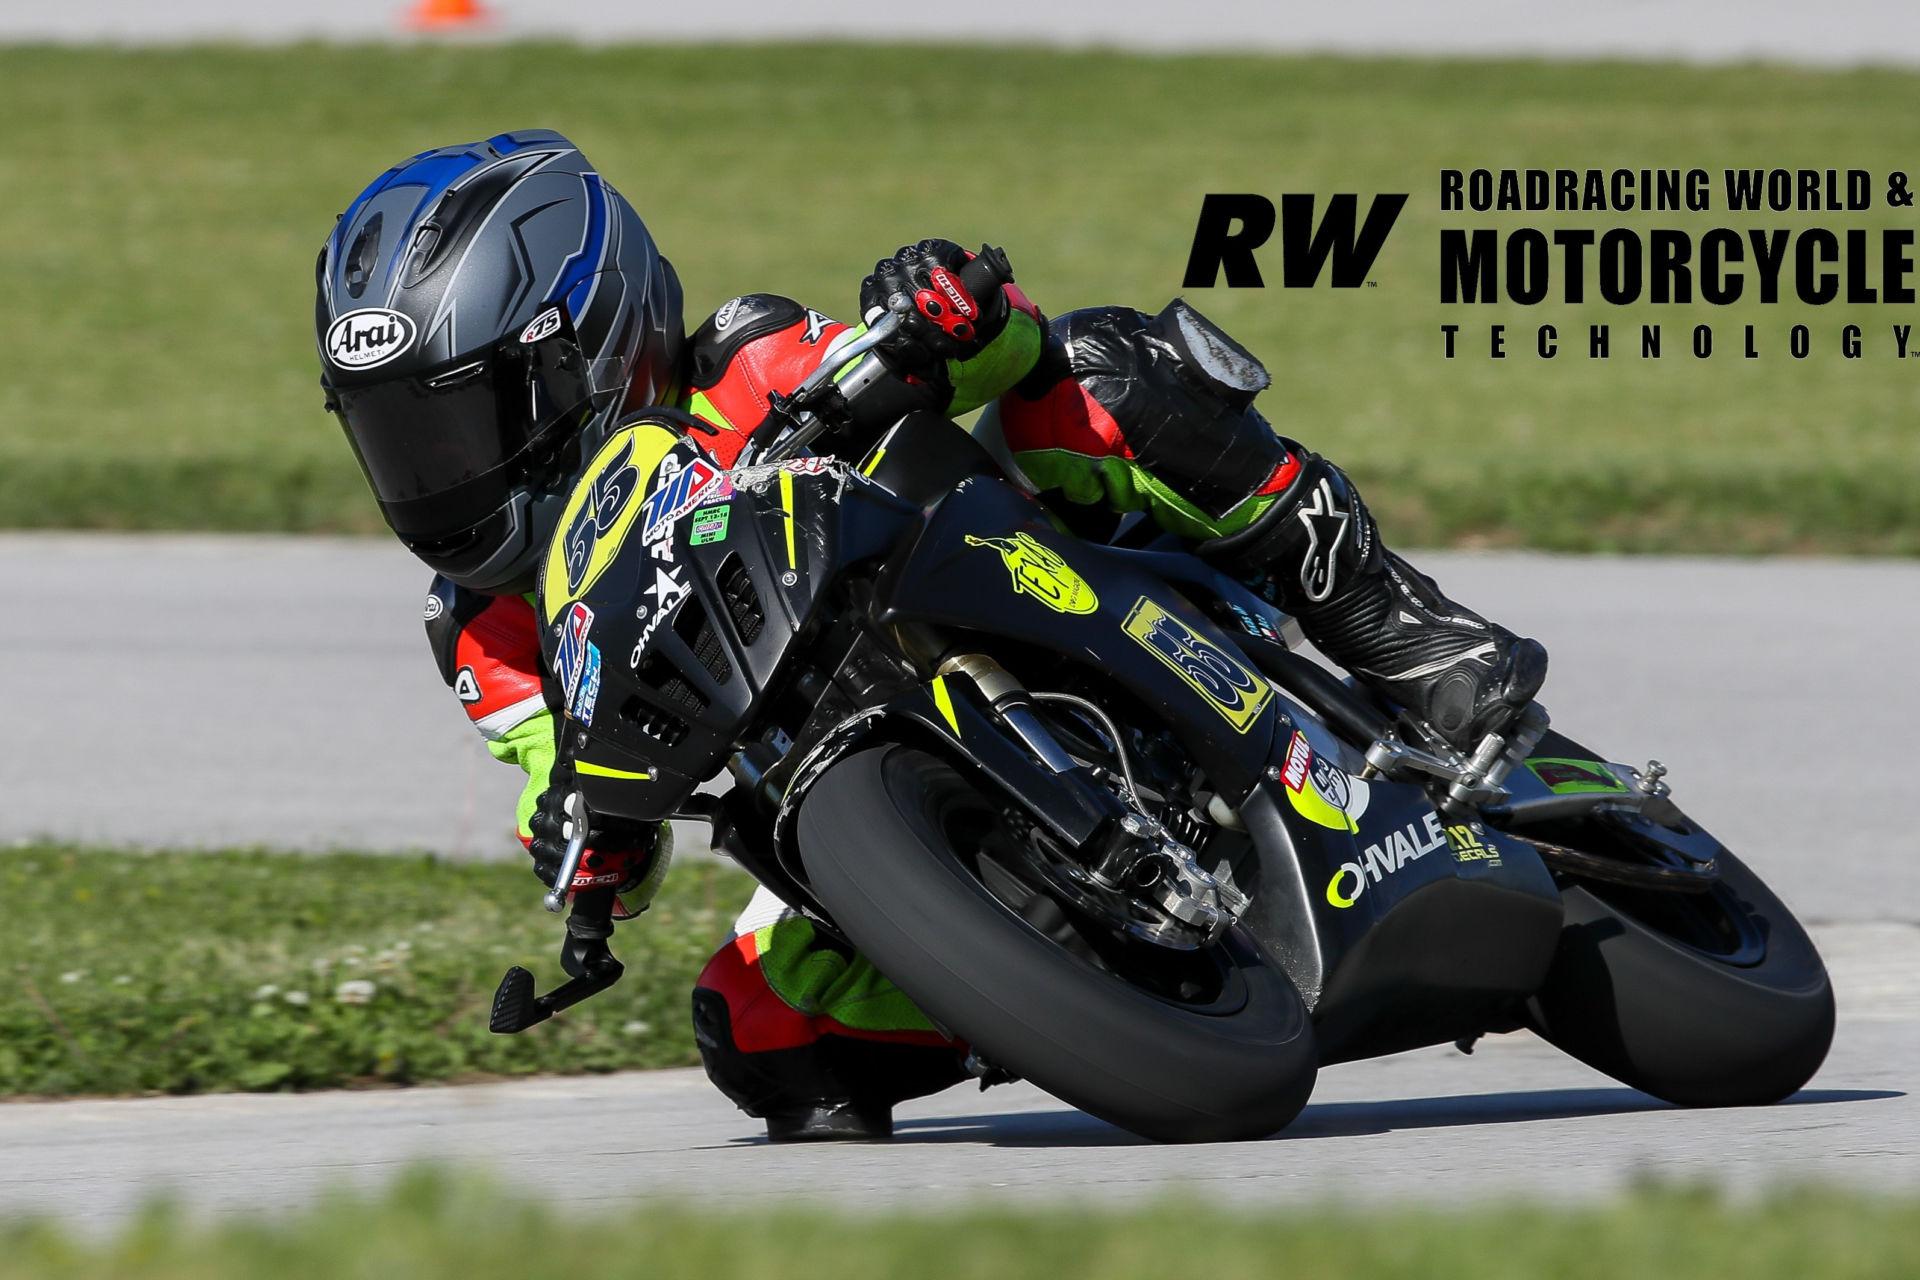 Mikey Lou Sanchez (55) on his Ohvale MotoAmerica Mini Cup racebike. Photo by Brian J. Nelson.